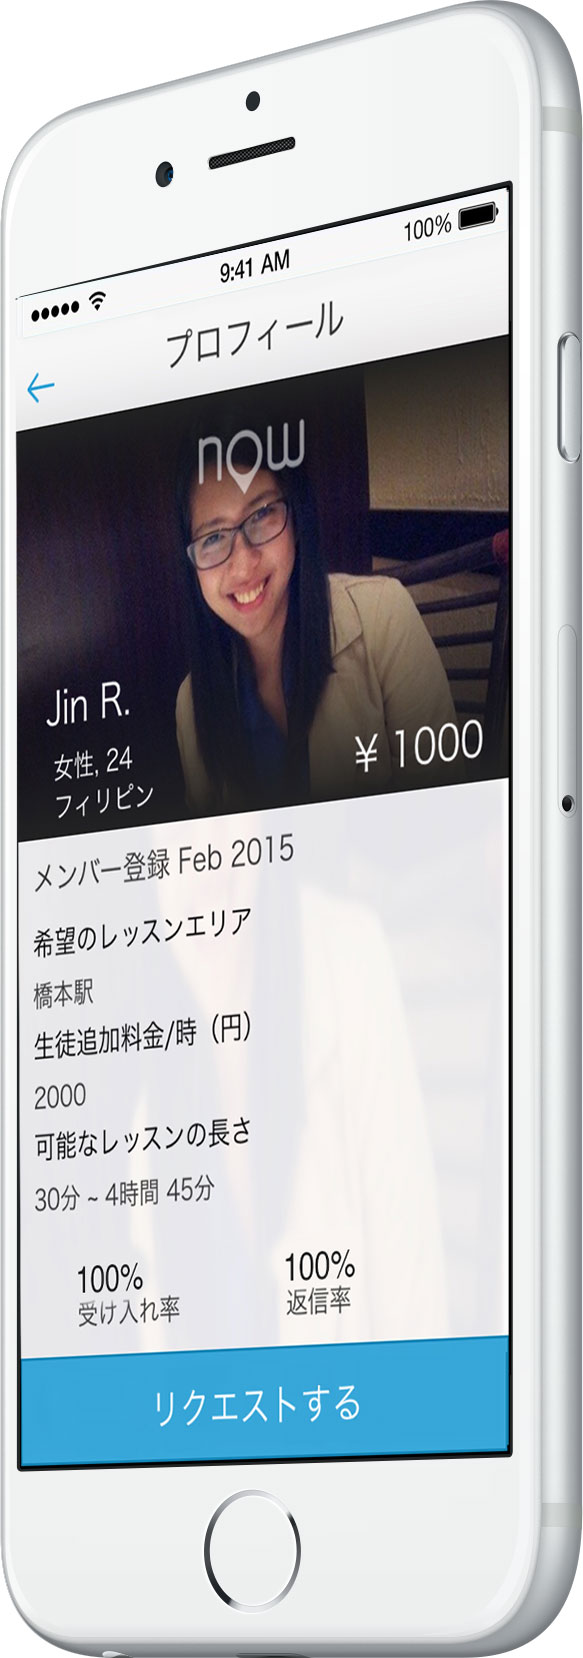 teacher_Jin_side.jpg